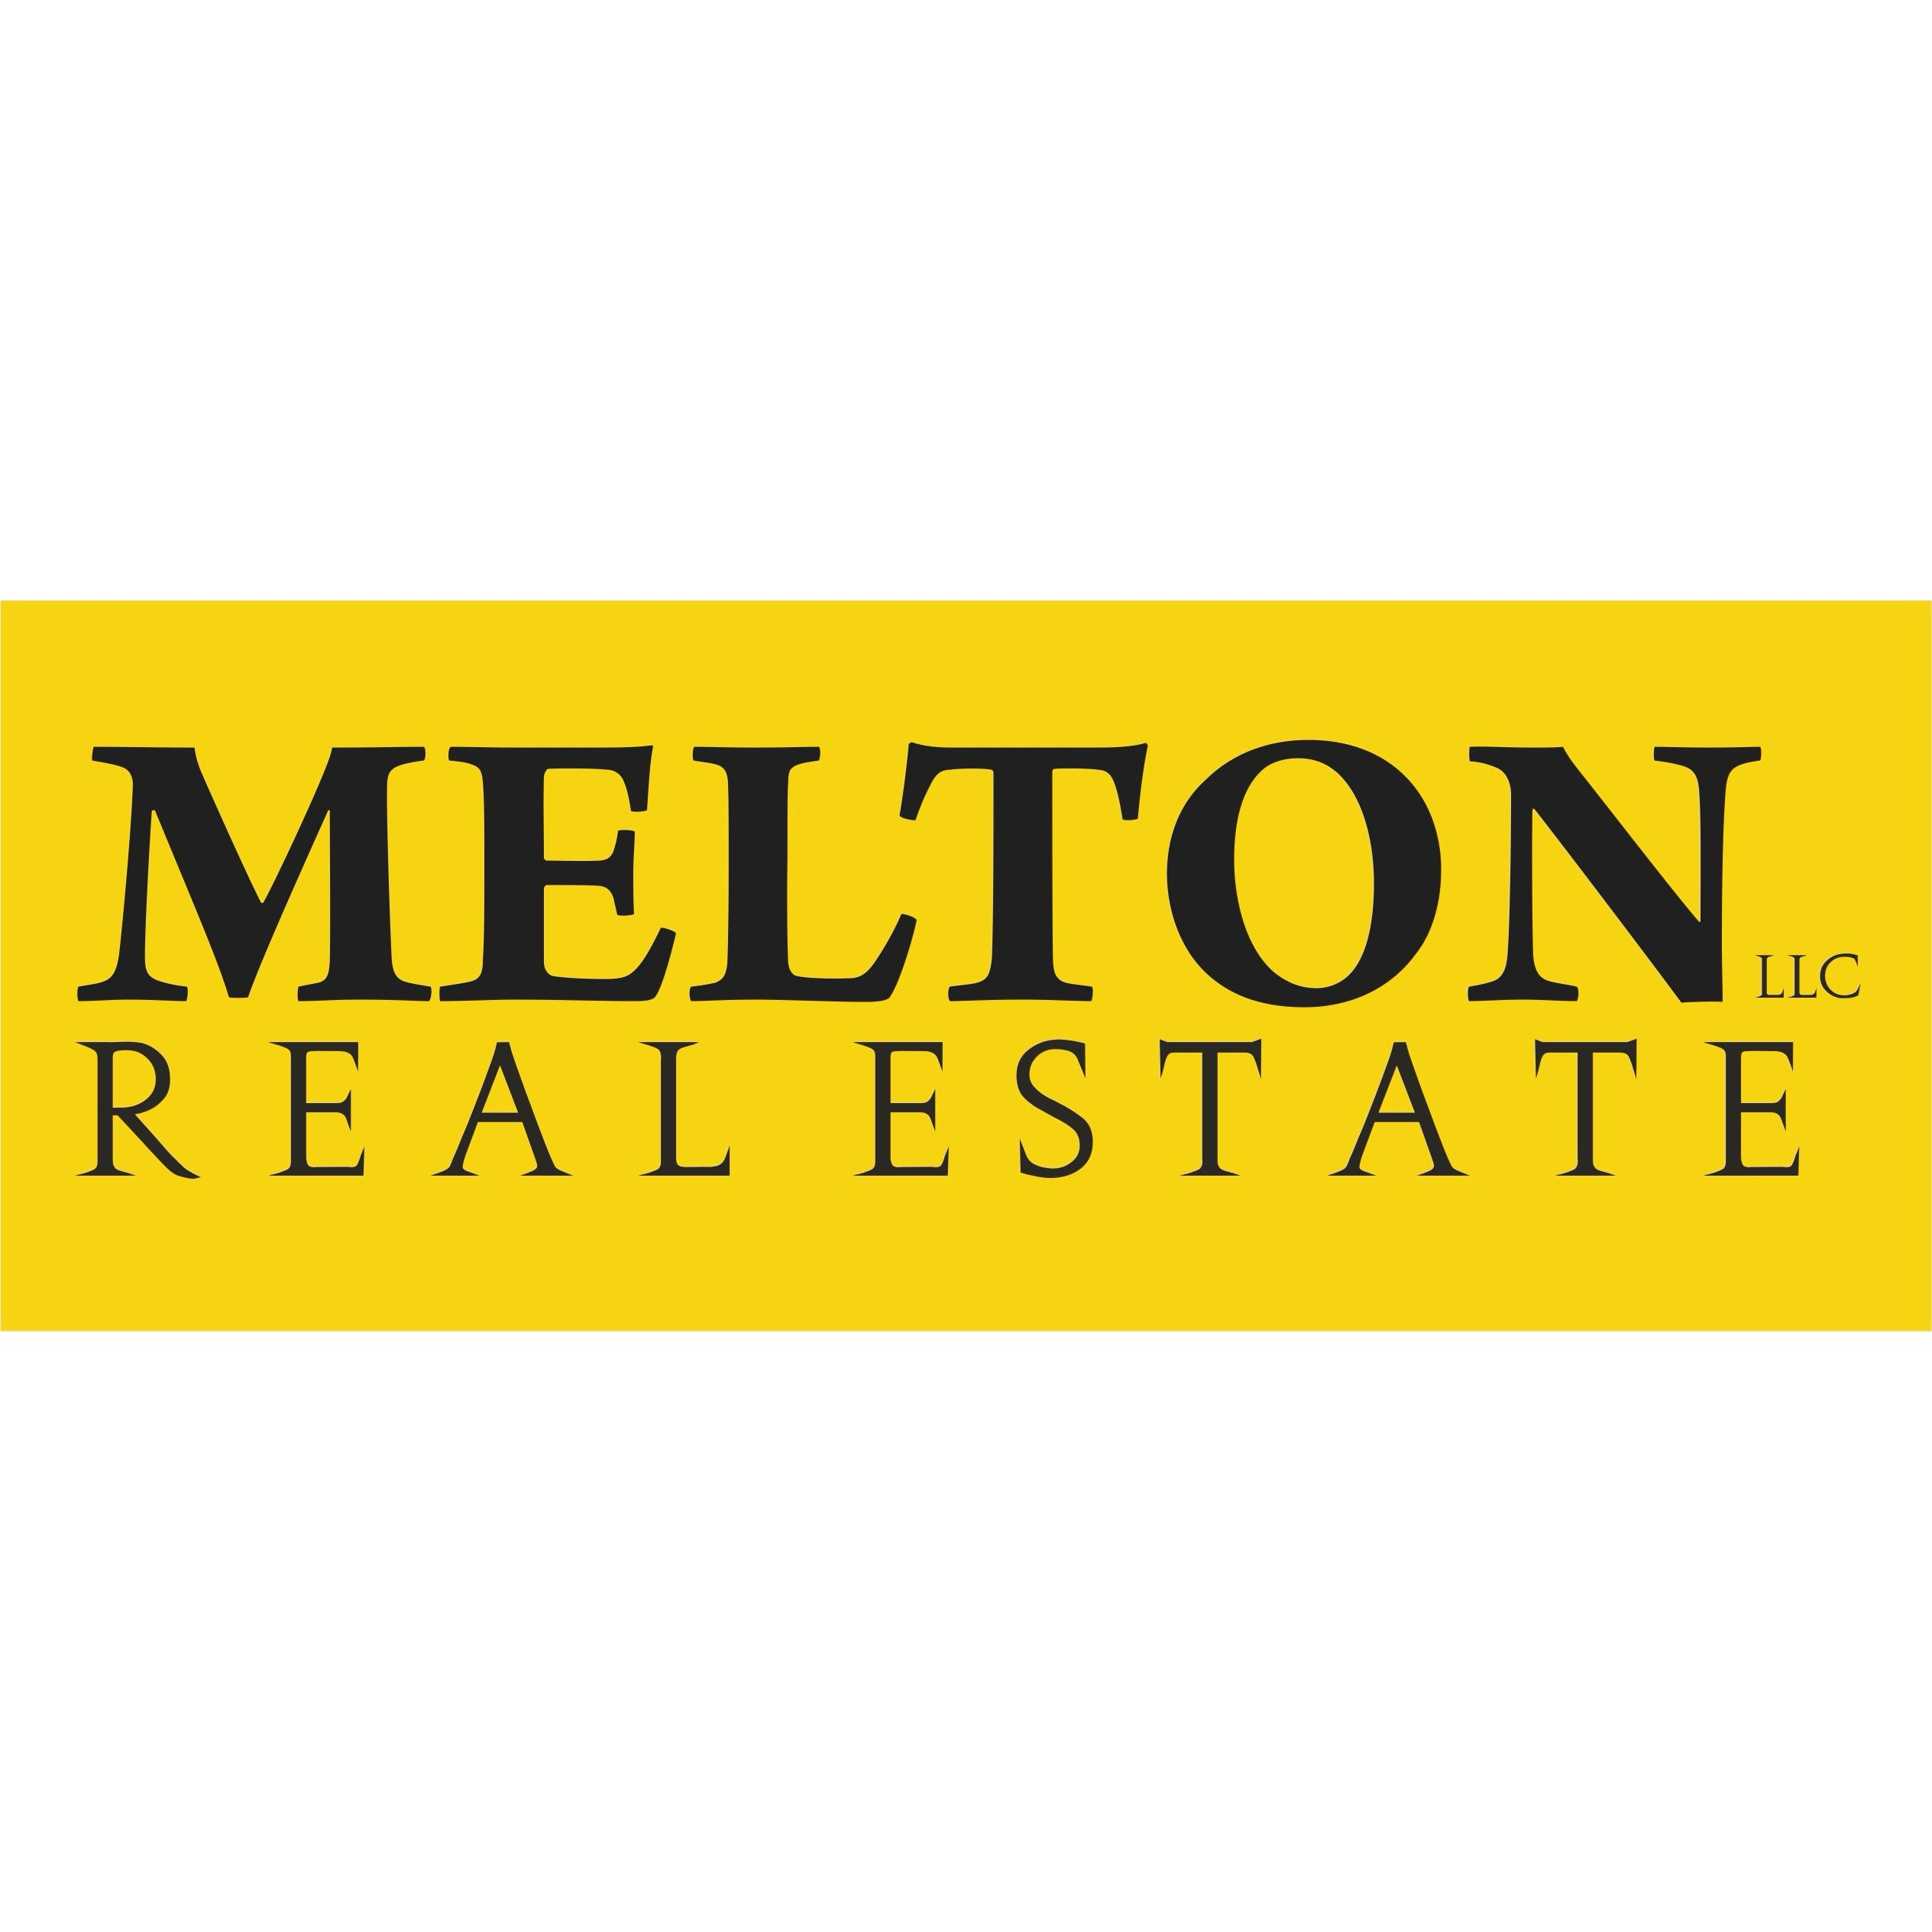 Melton Real Estate